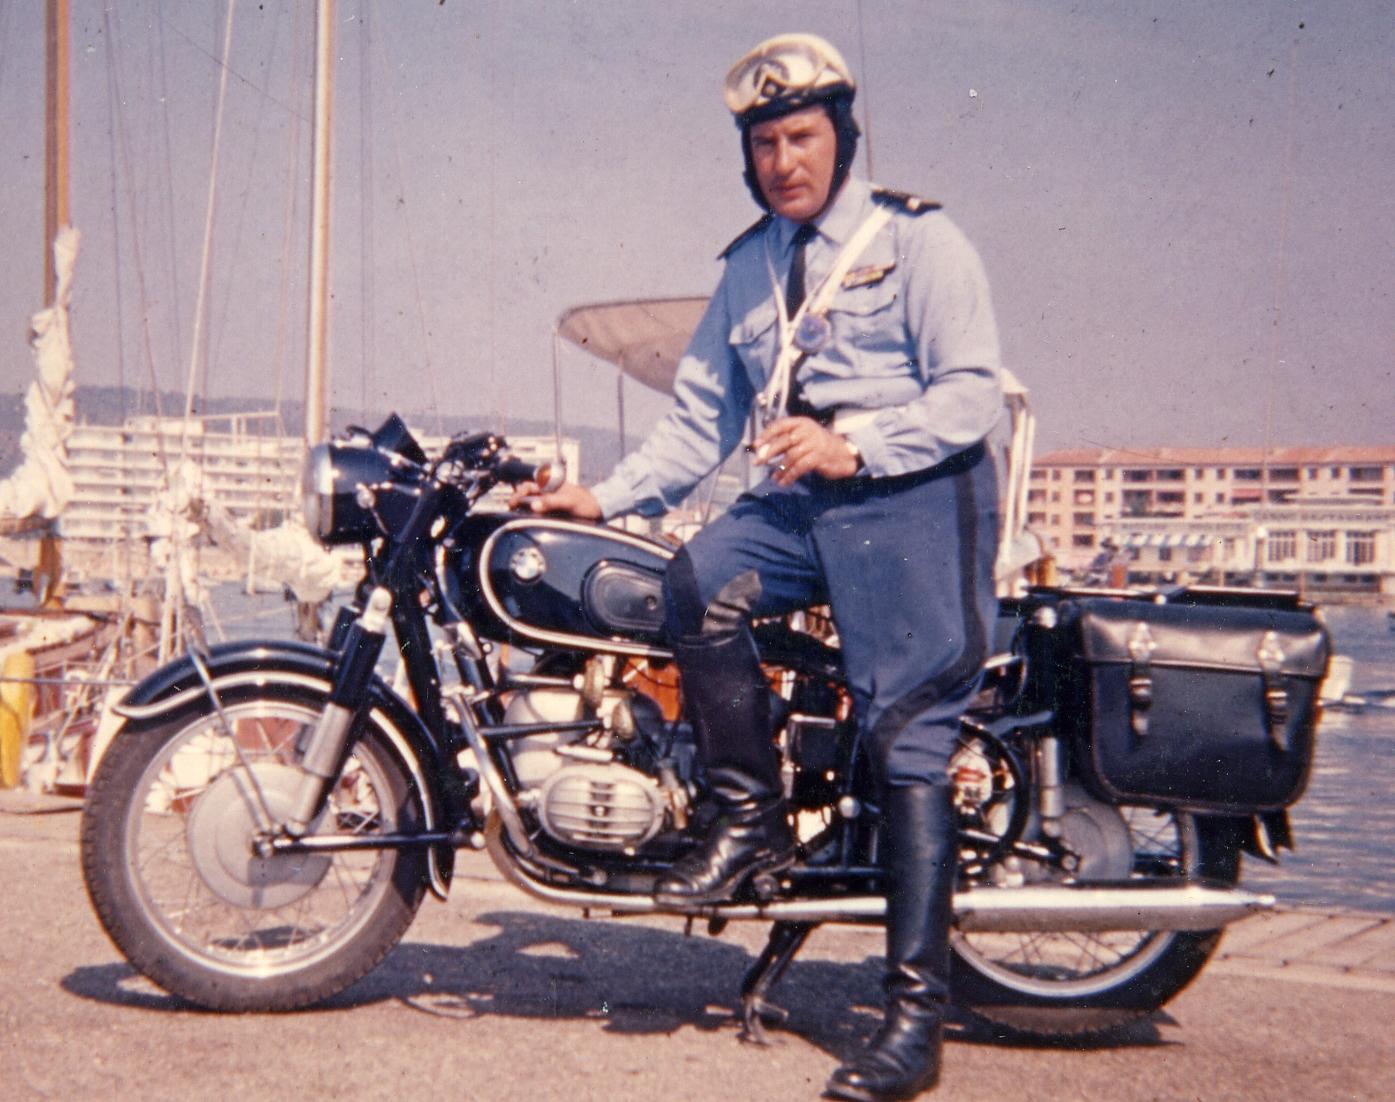 Photos Gendarmerie, BMO de Hyeres  années 1960 241274File0140